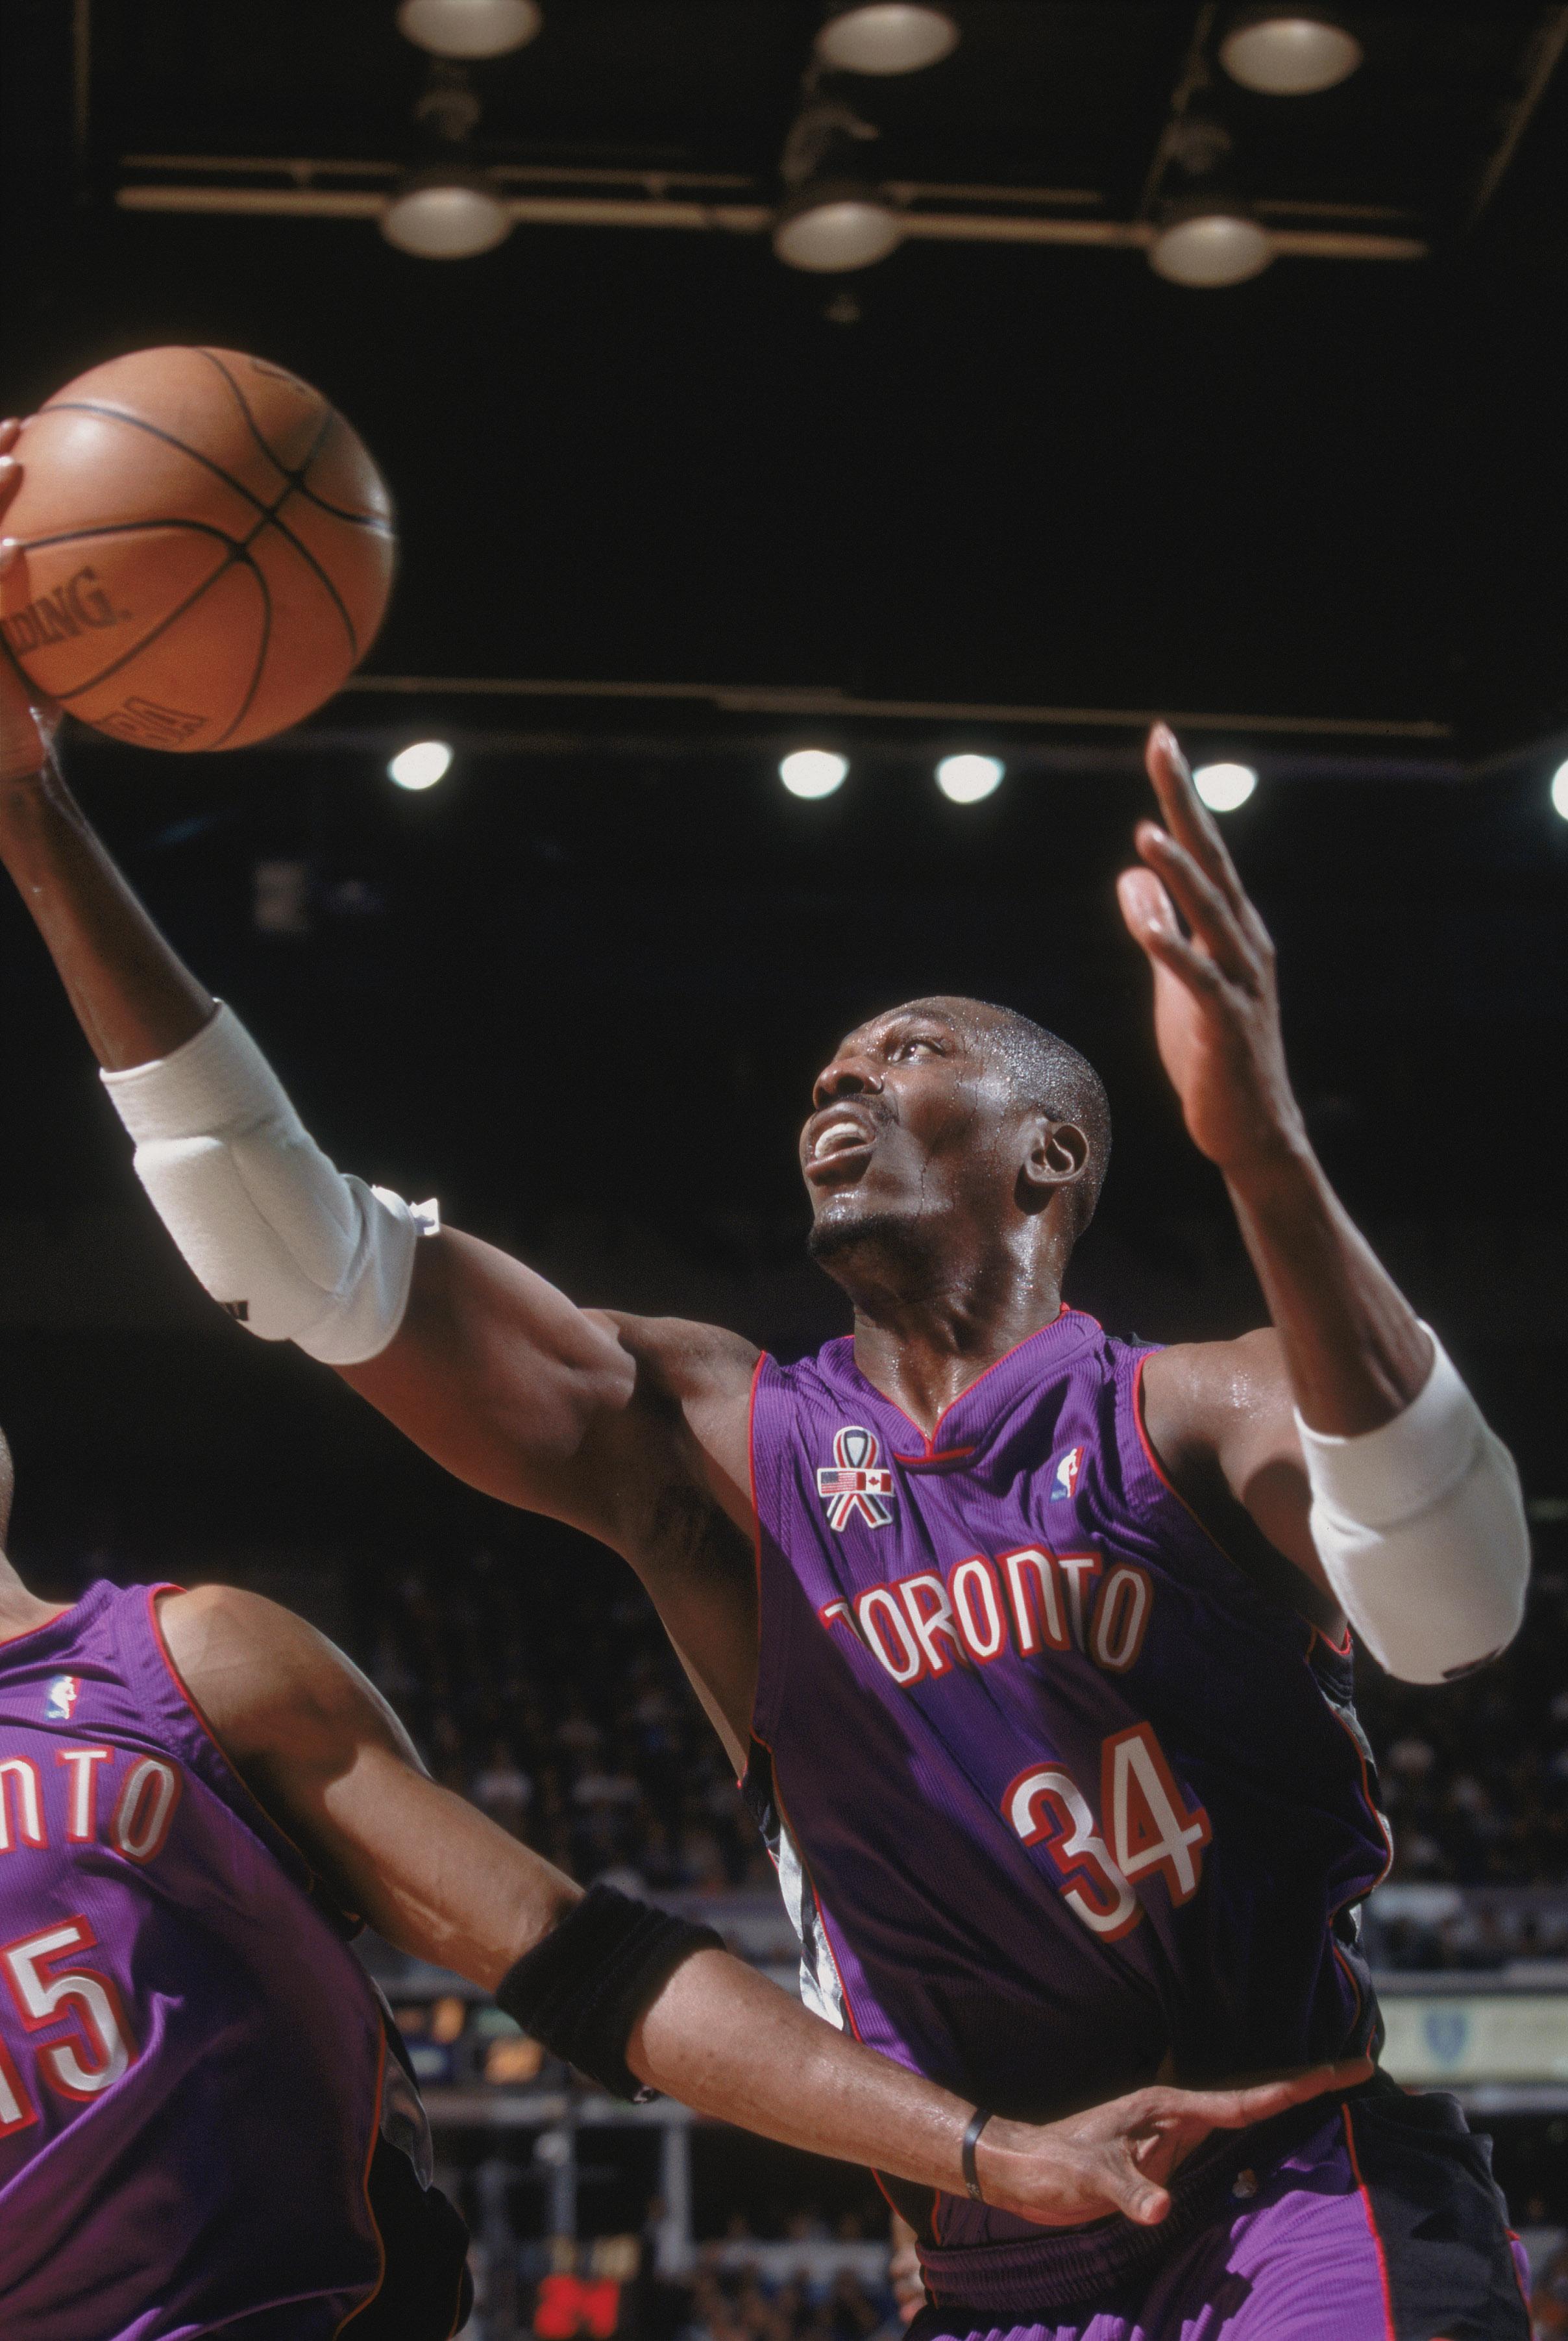 0727268417d 14 Nov 2001  Center Hakeem Olajuwon  34 of the Toronto Raptors grabs the  ball